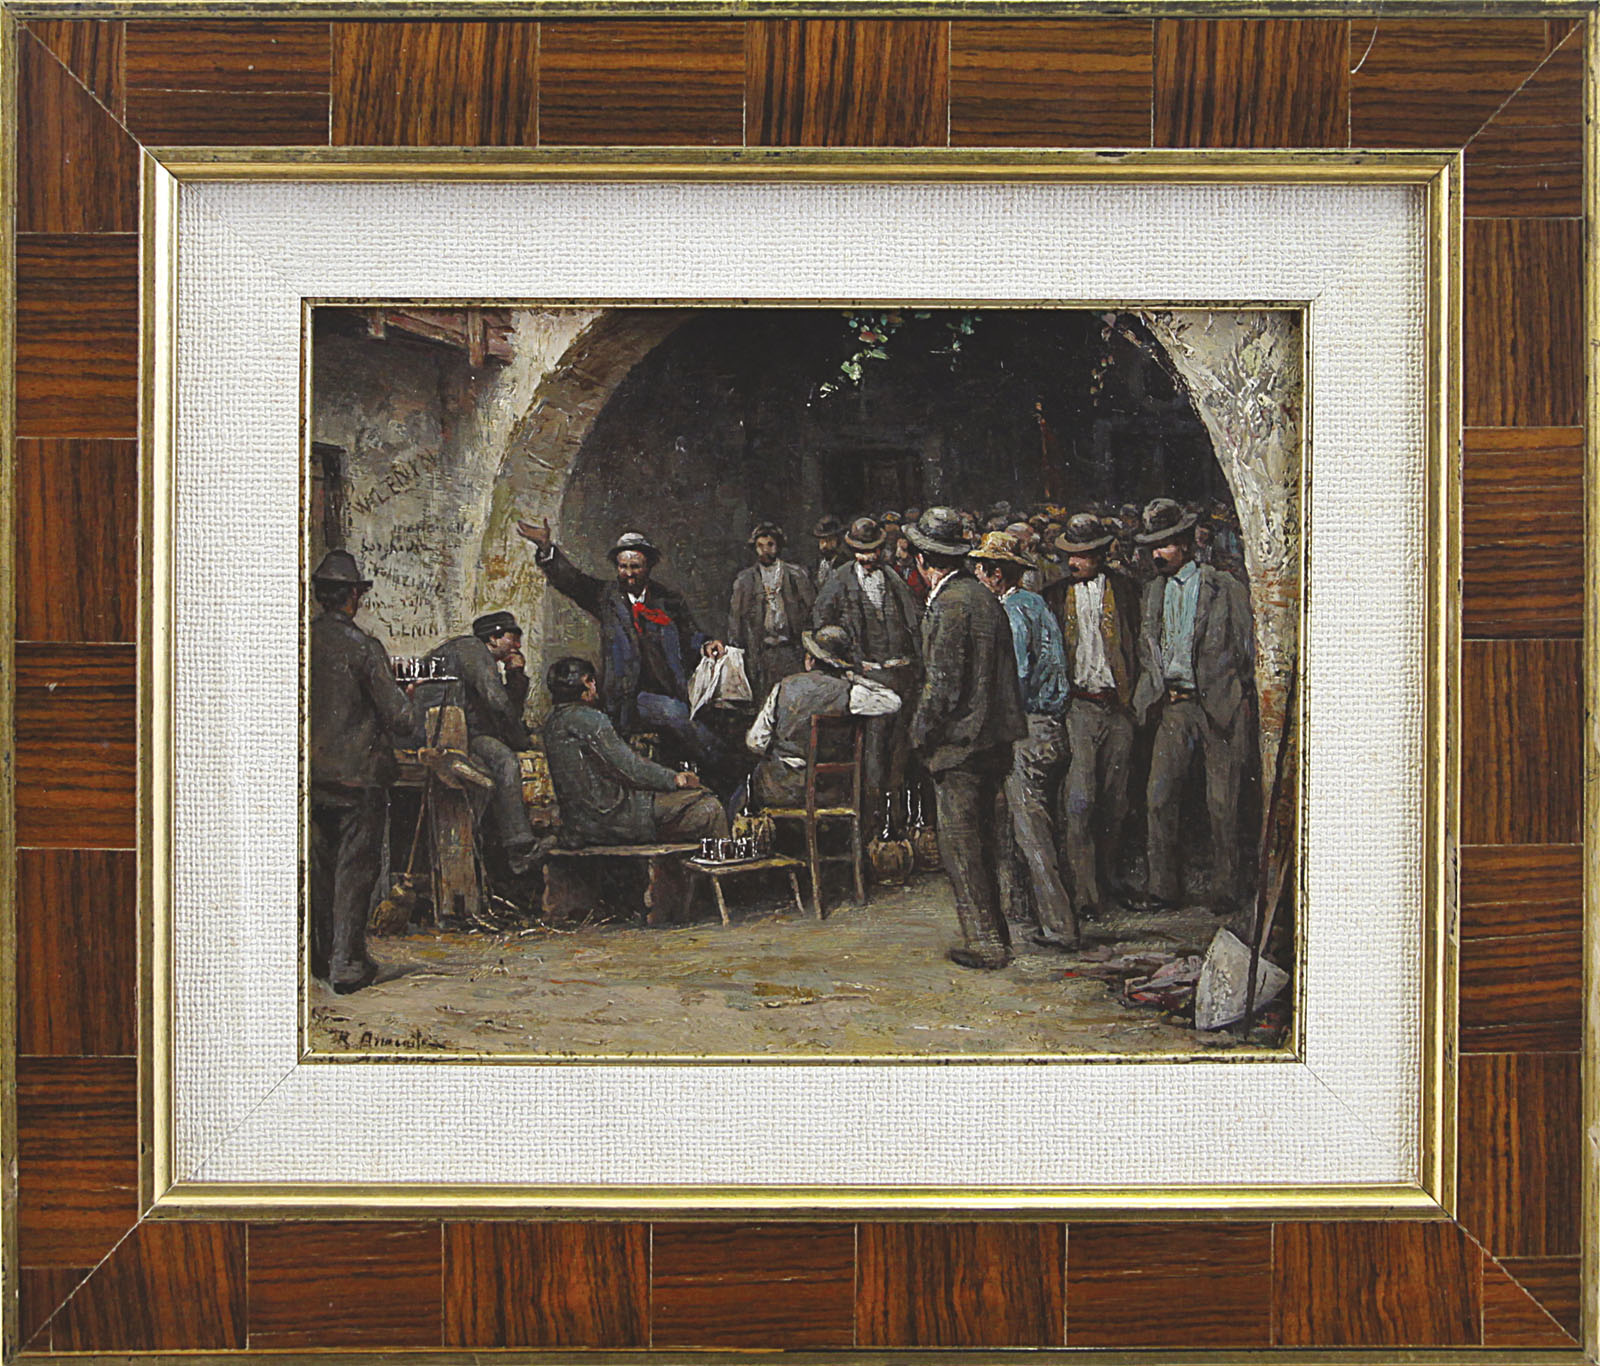 Calendario Aste Trani.Armenise Raffaele Bari 19 03 1852 Milano 14 01 1925